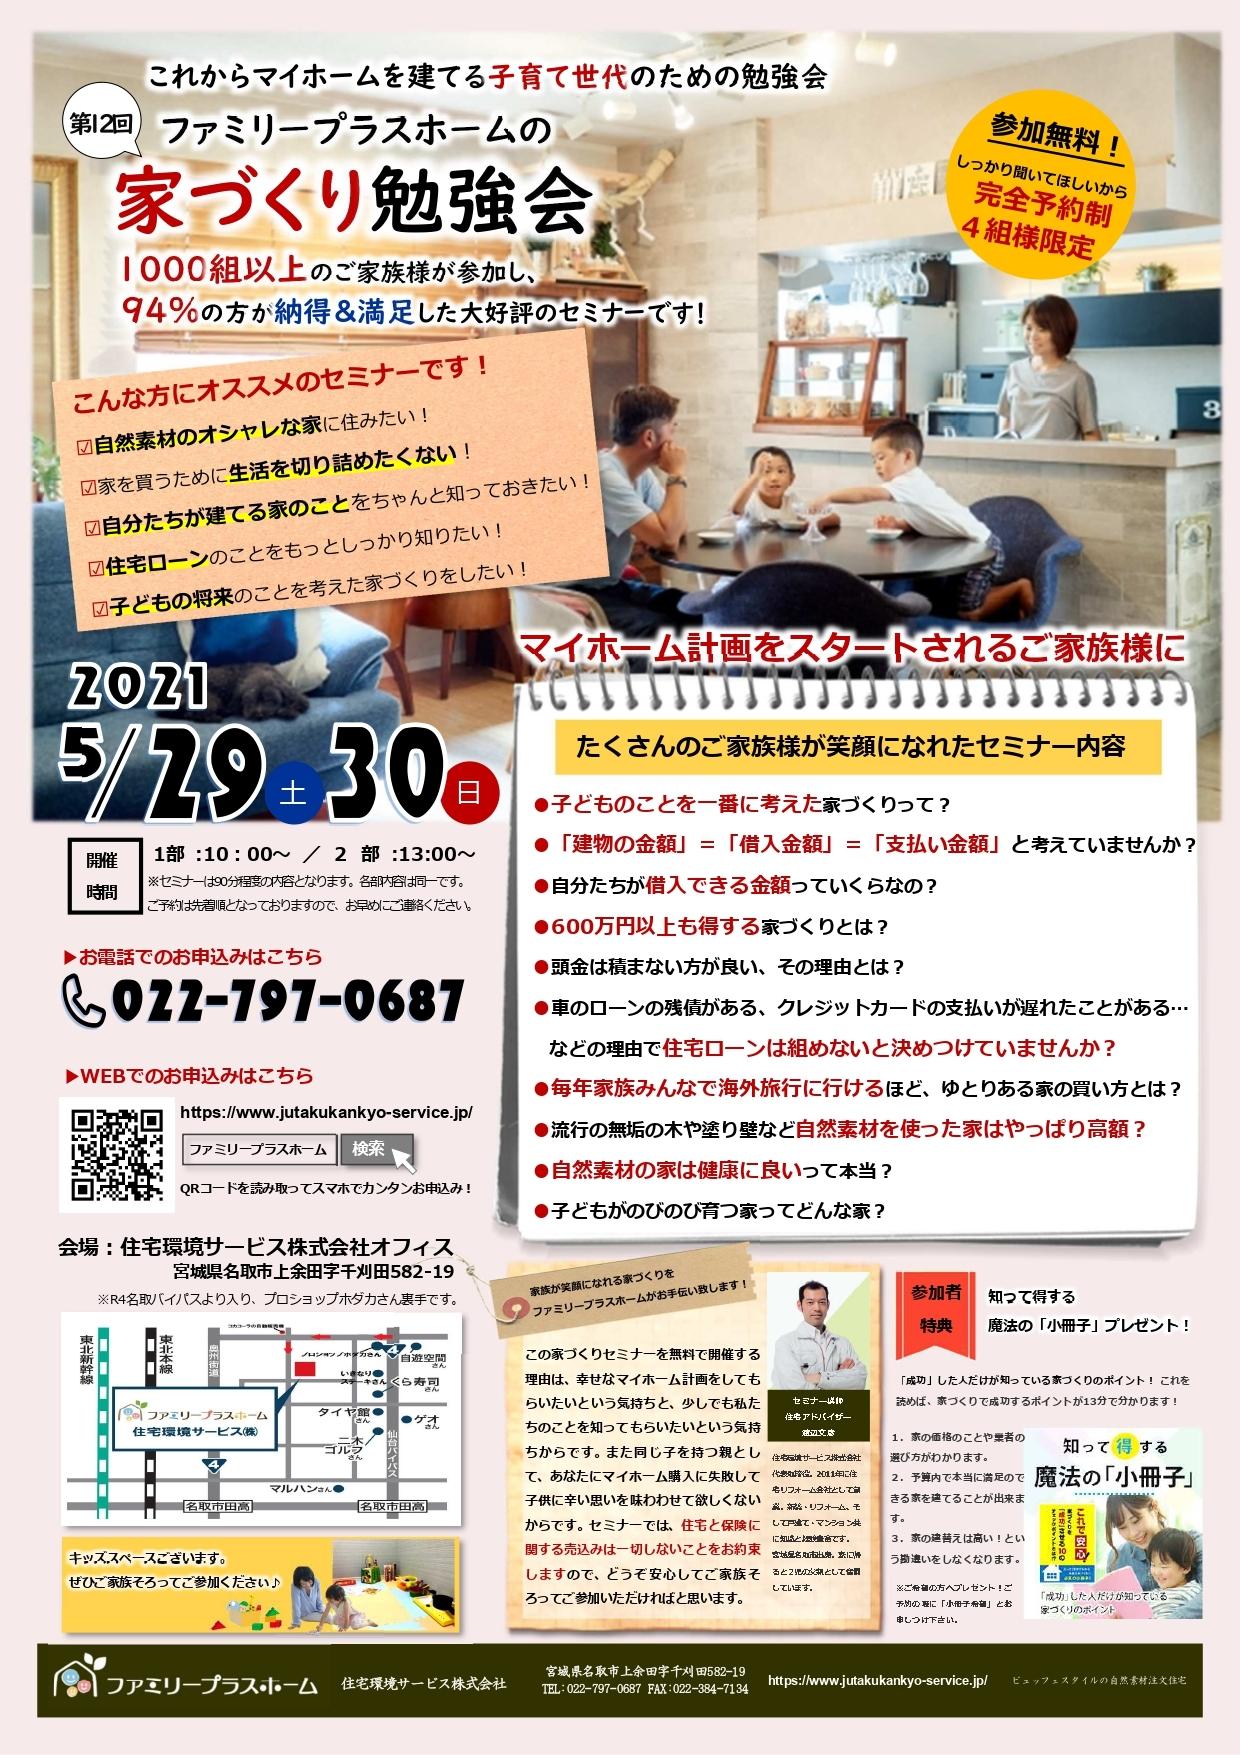 https://www.jutakukankyo-service.jp/b6f74dcd2d831f24b57143f76d3a19597b8c5886.jpg